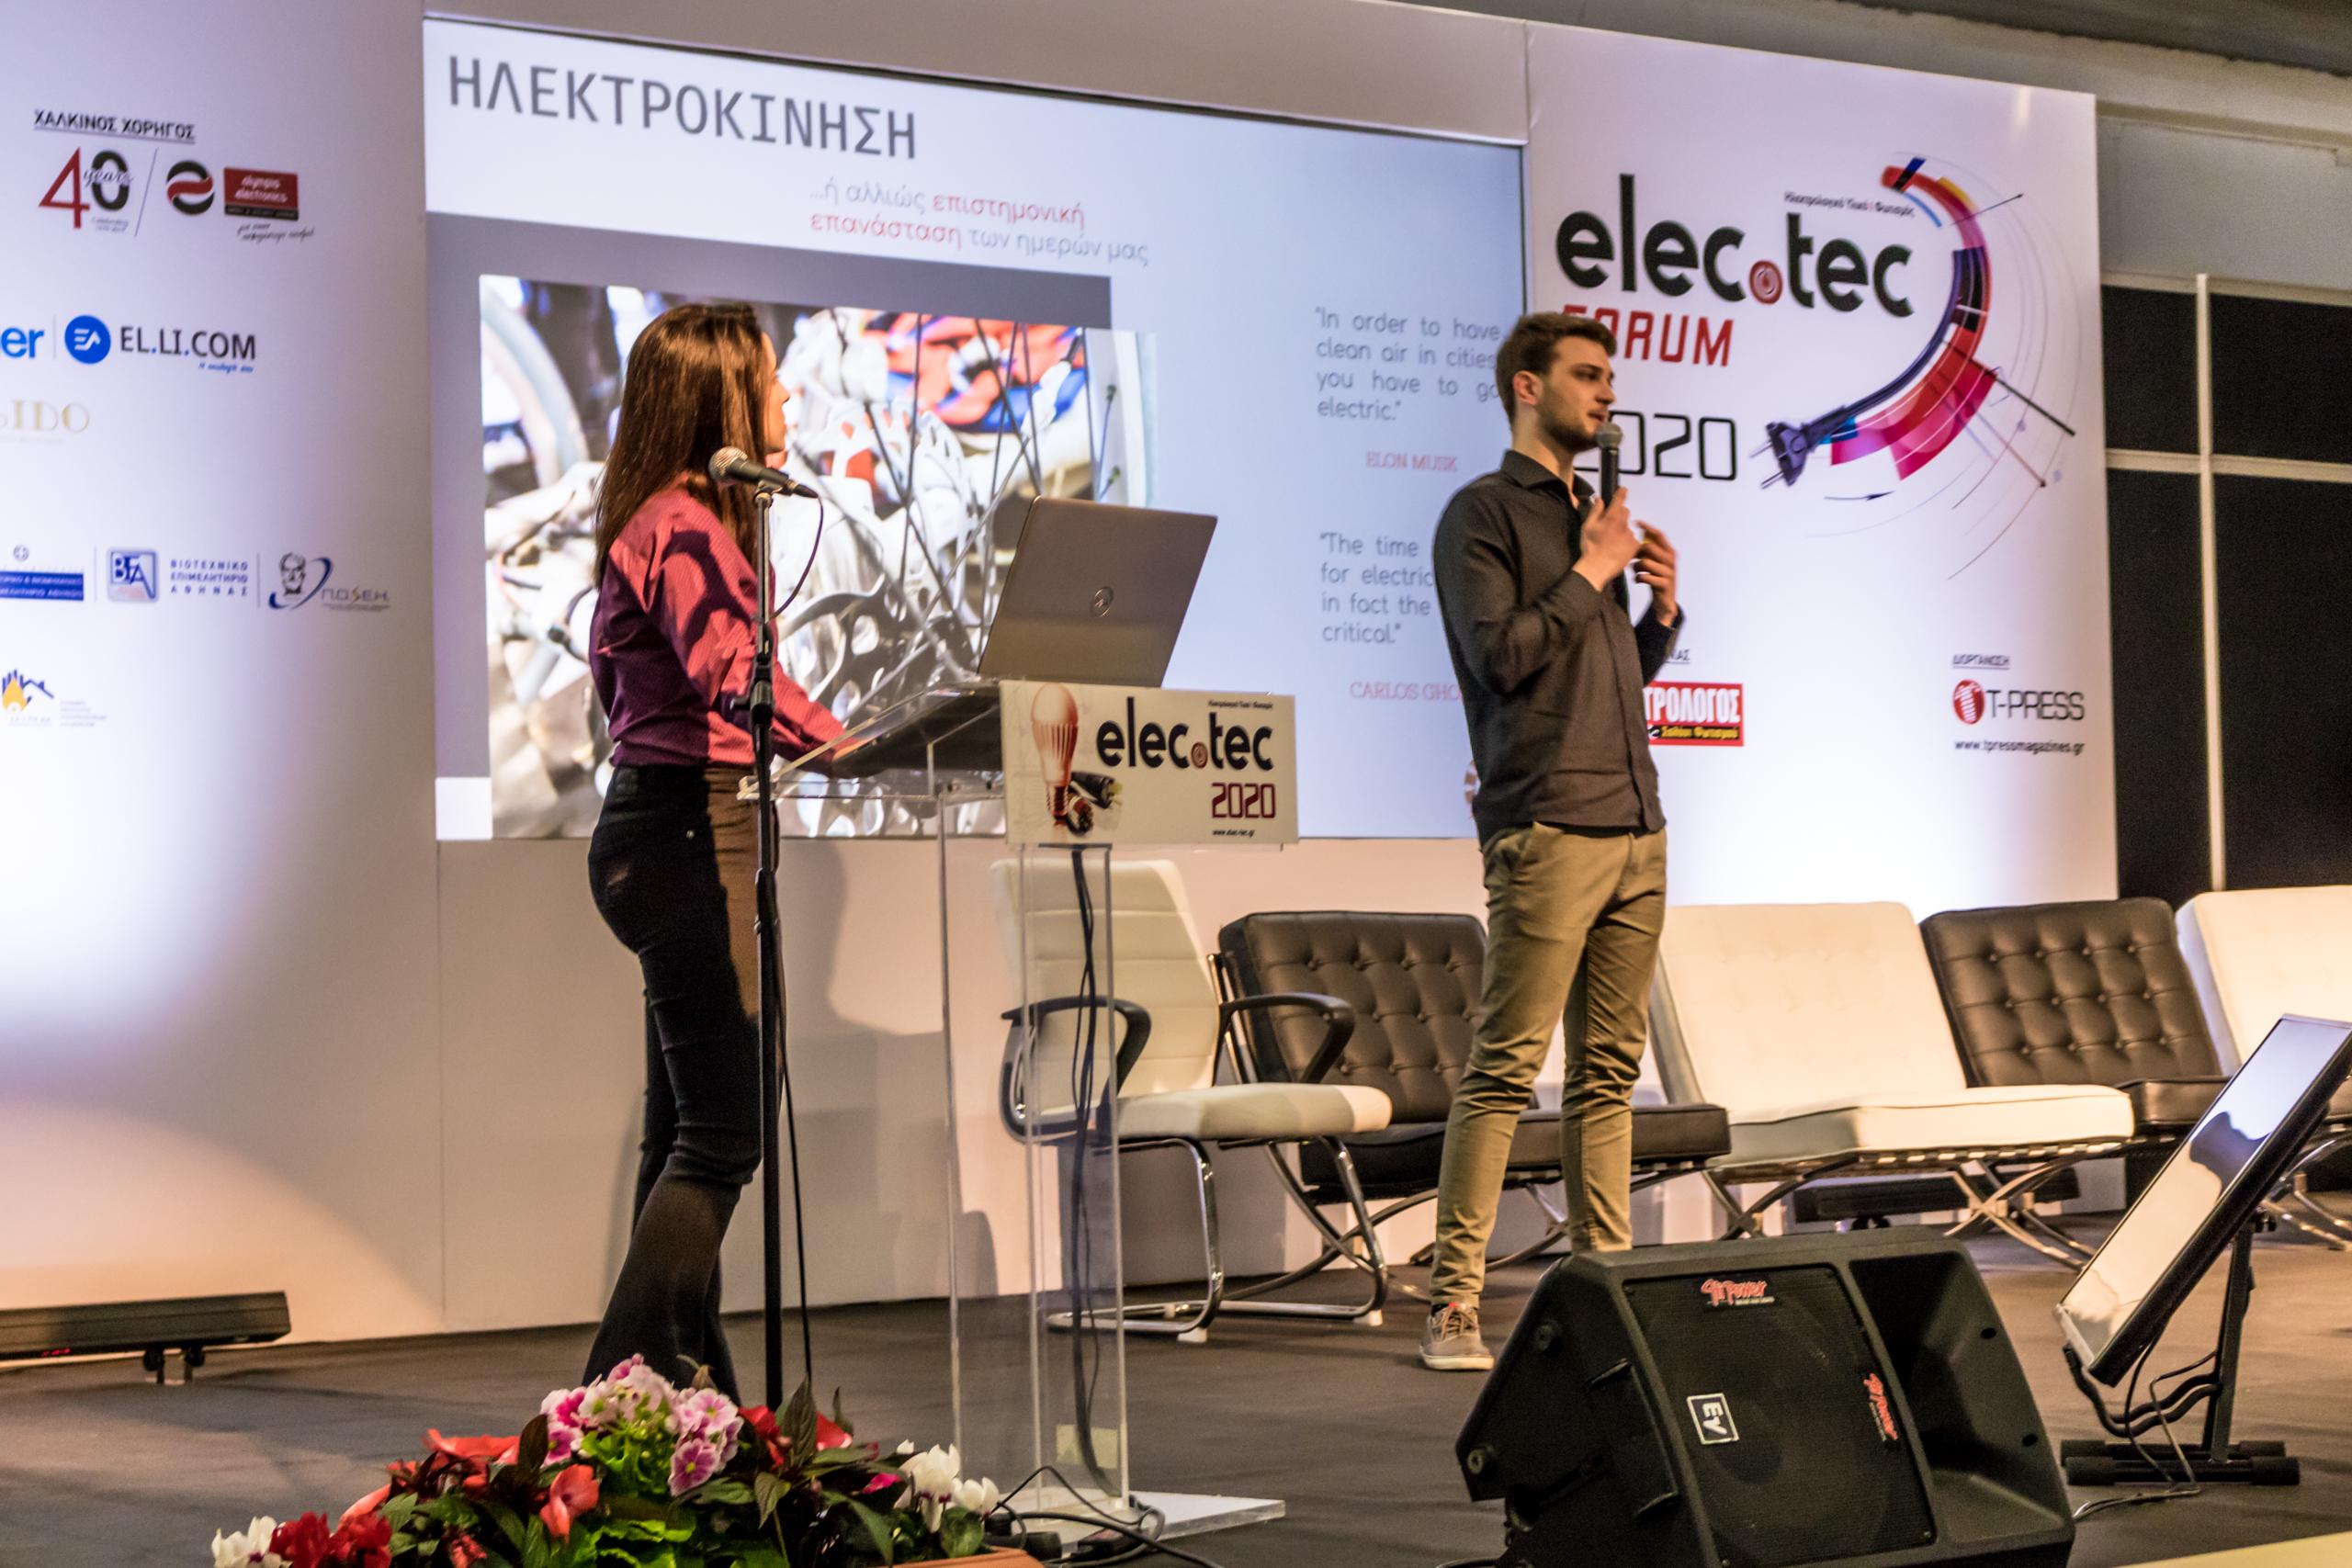 Prometheus Eco Racing presents its activities in Elec.Tec 2020